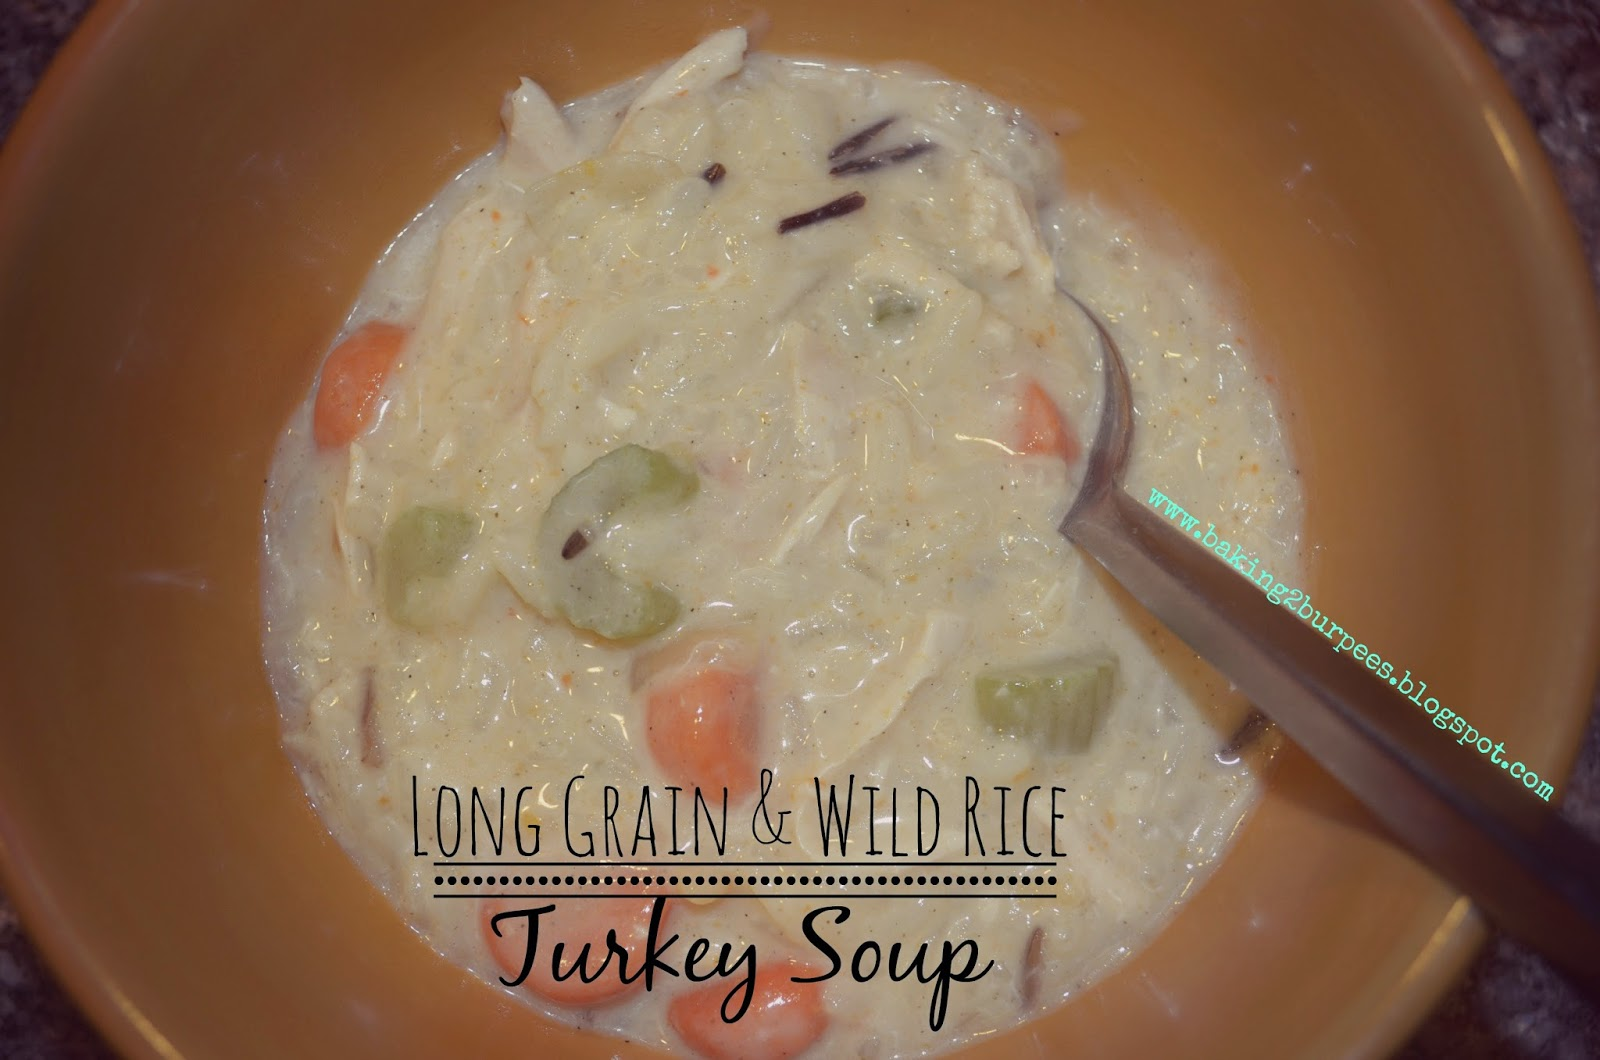 Erin Traill, diamond beachbody coach, long grain and wild rice turkey soup, turkey, thanksgiving, healthy recipe, weight loss success, leftover turkey, thanksgiving leftovers